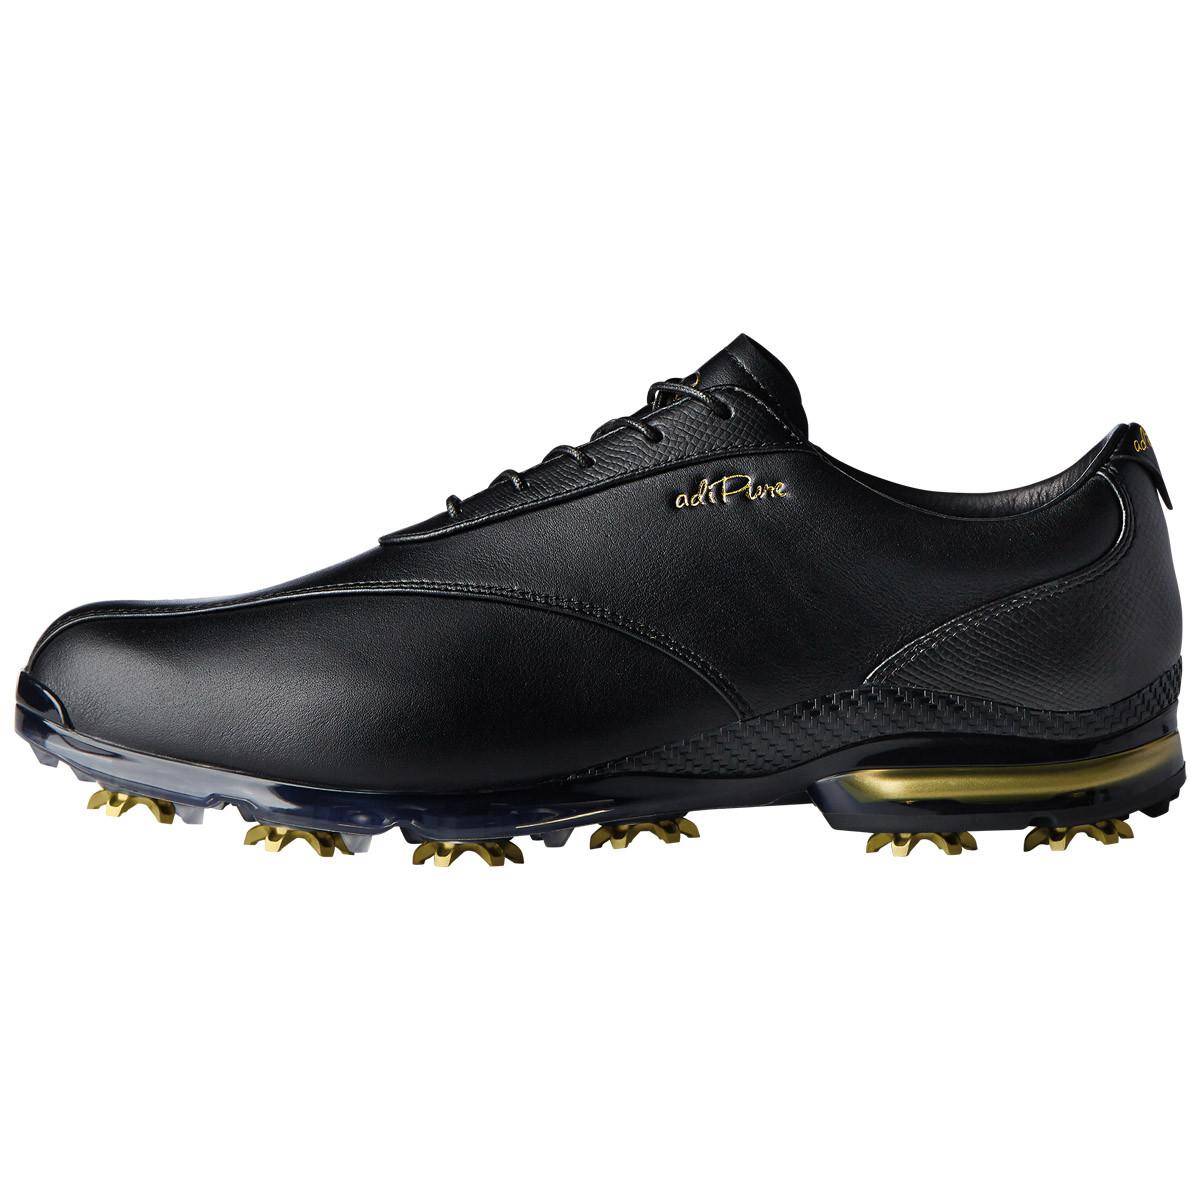 huge discount 02eb3 61fff adidas Golf Mens Adipure TP 2.0 Golf Shoes